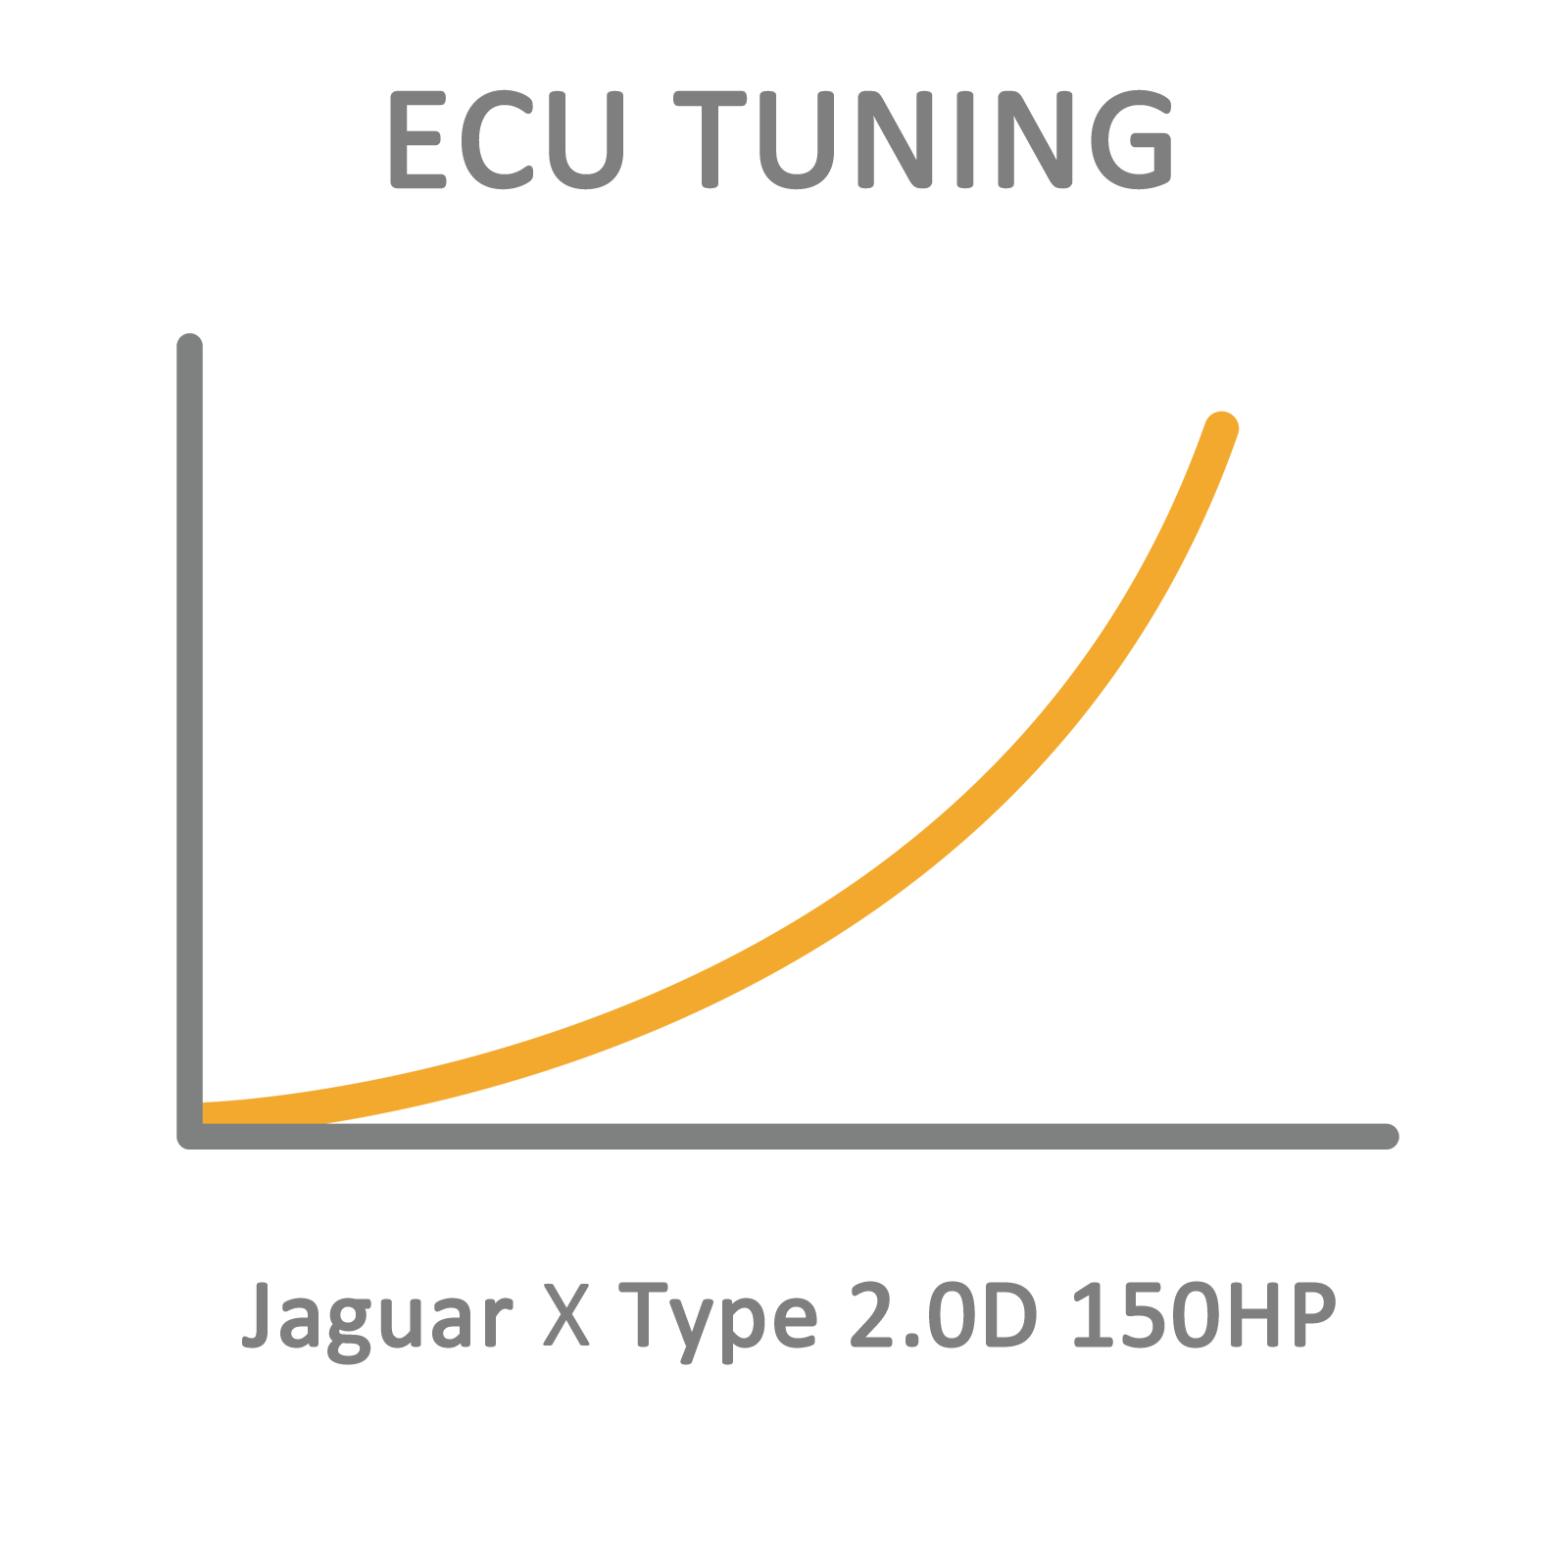 Jaguar X Type 2.0D 150HP ECU Tuning Remapping Programming